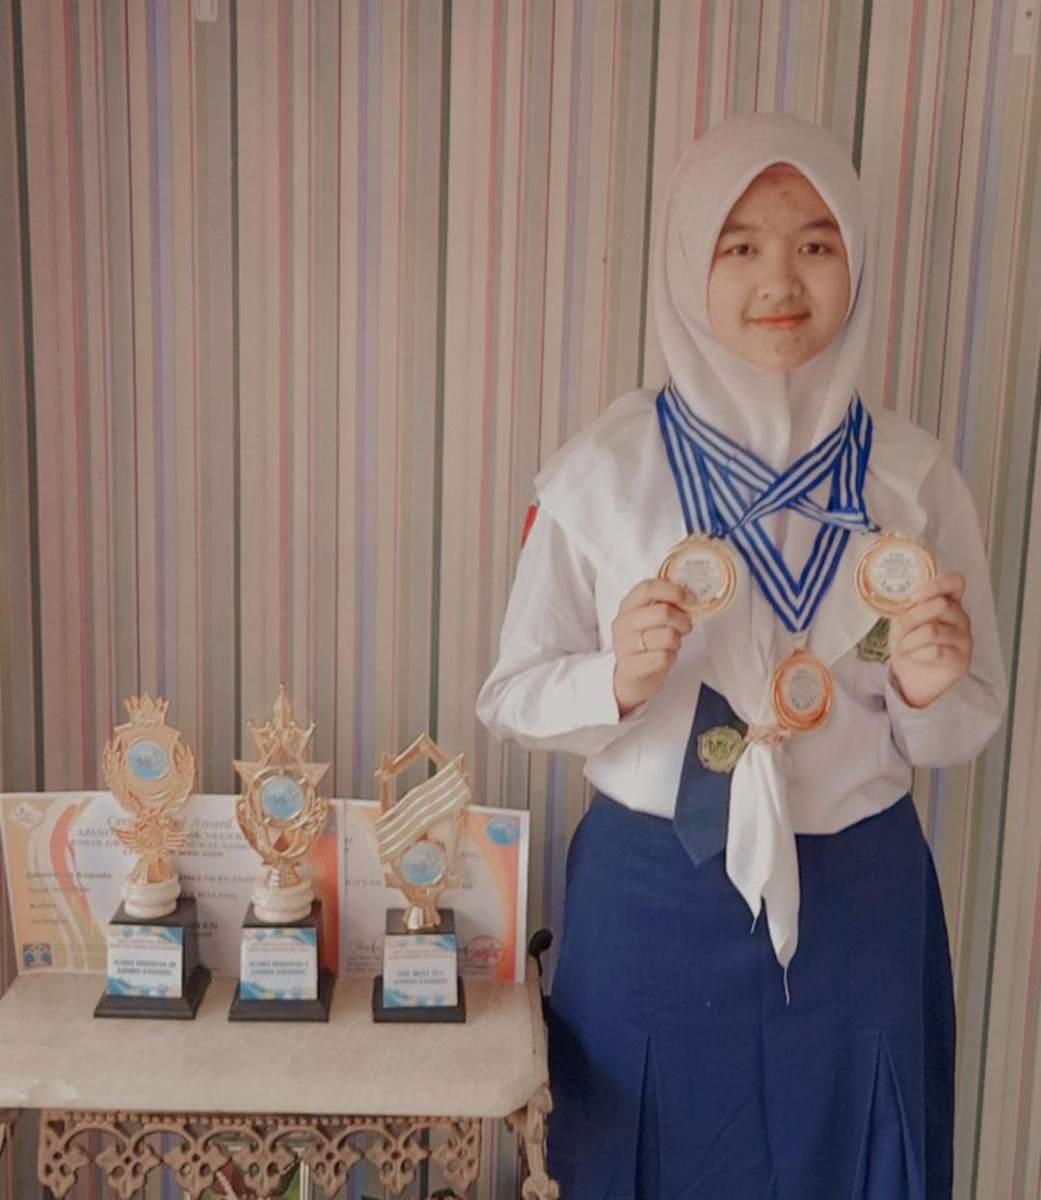 Syahna-Dwi-Setyaningtyas-Siswi-MTsN-2-Kota-Malang-Peraih-Juara-Olimpiade-Matematika-dan-Fashion